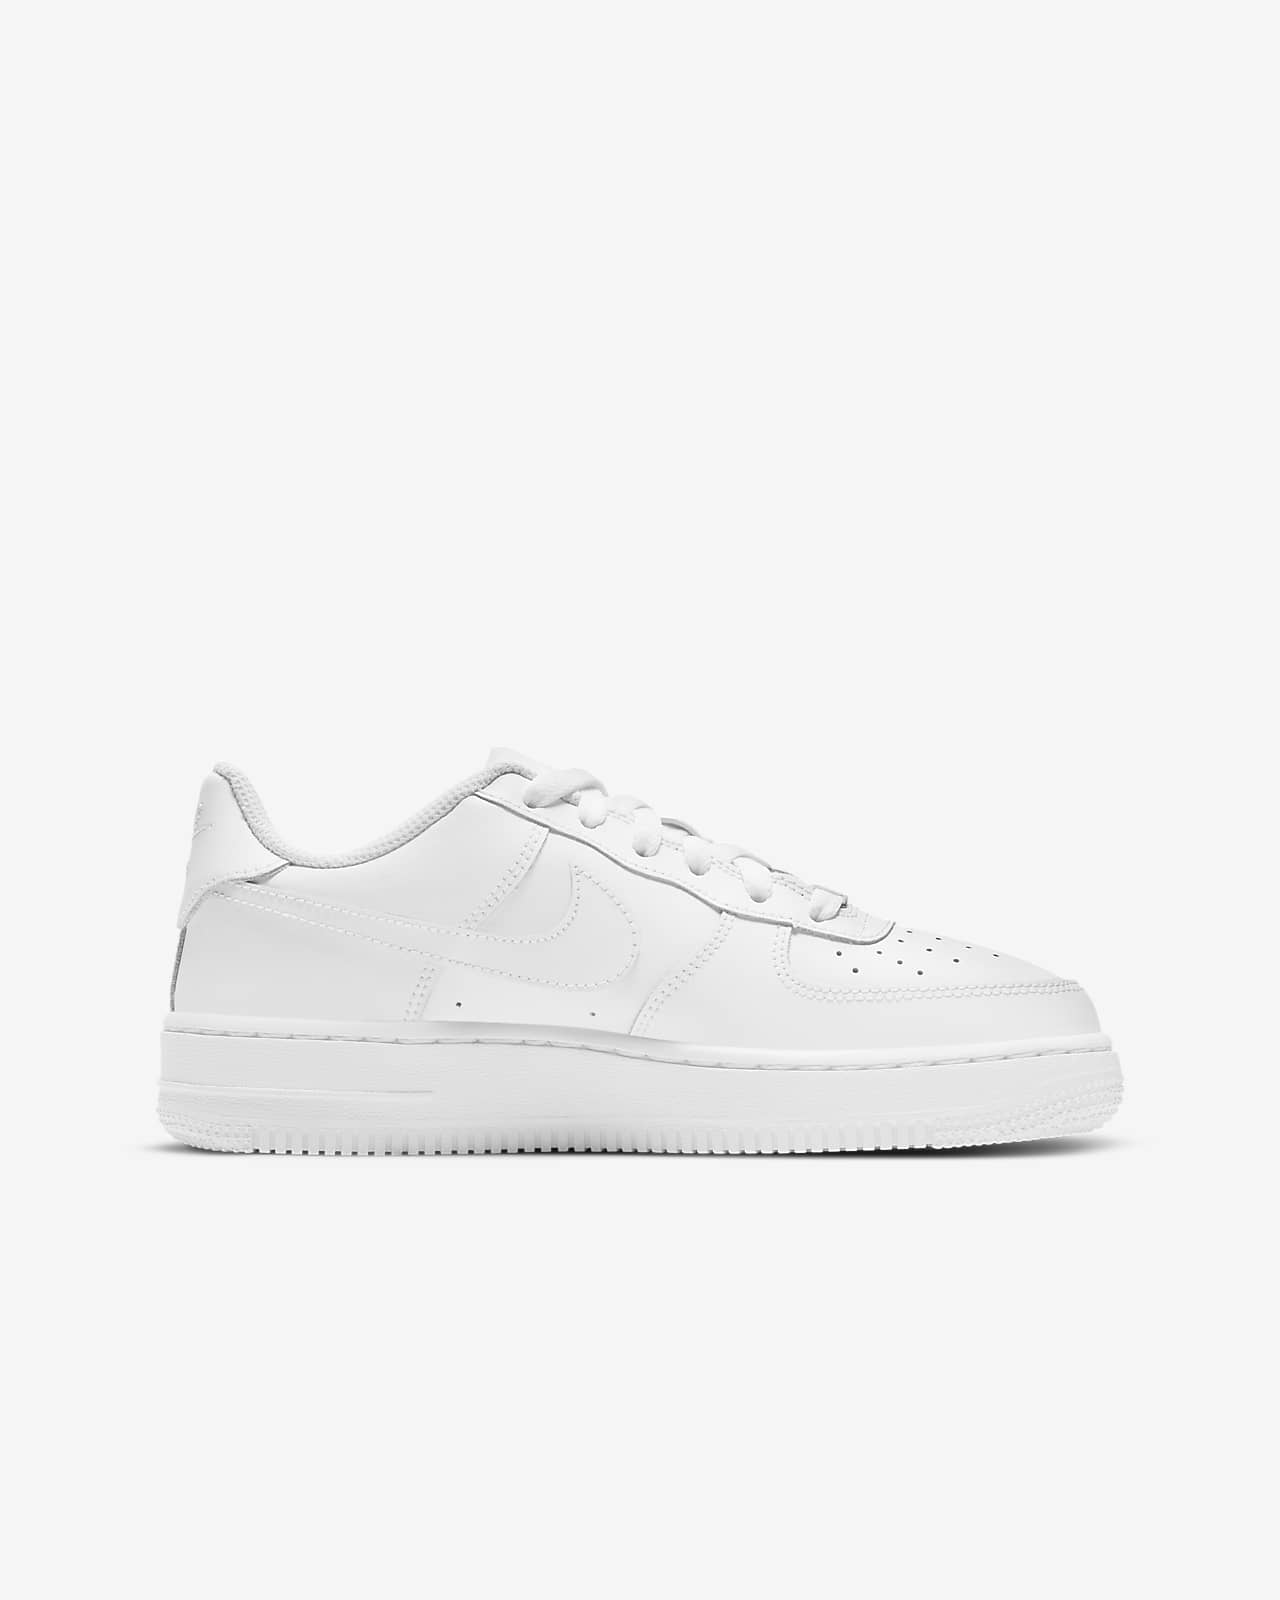 Scarpa Nike Air Force 1 LE - Ragazzi